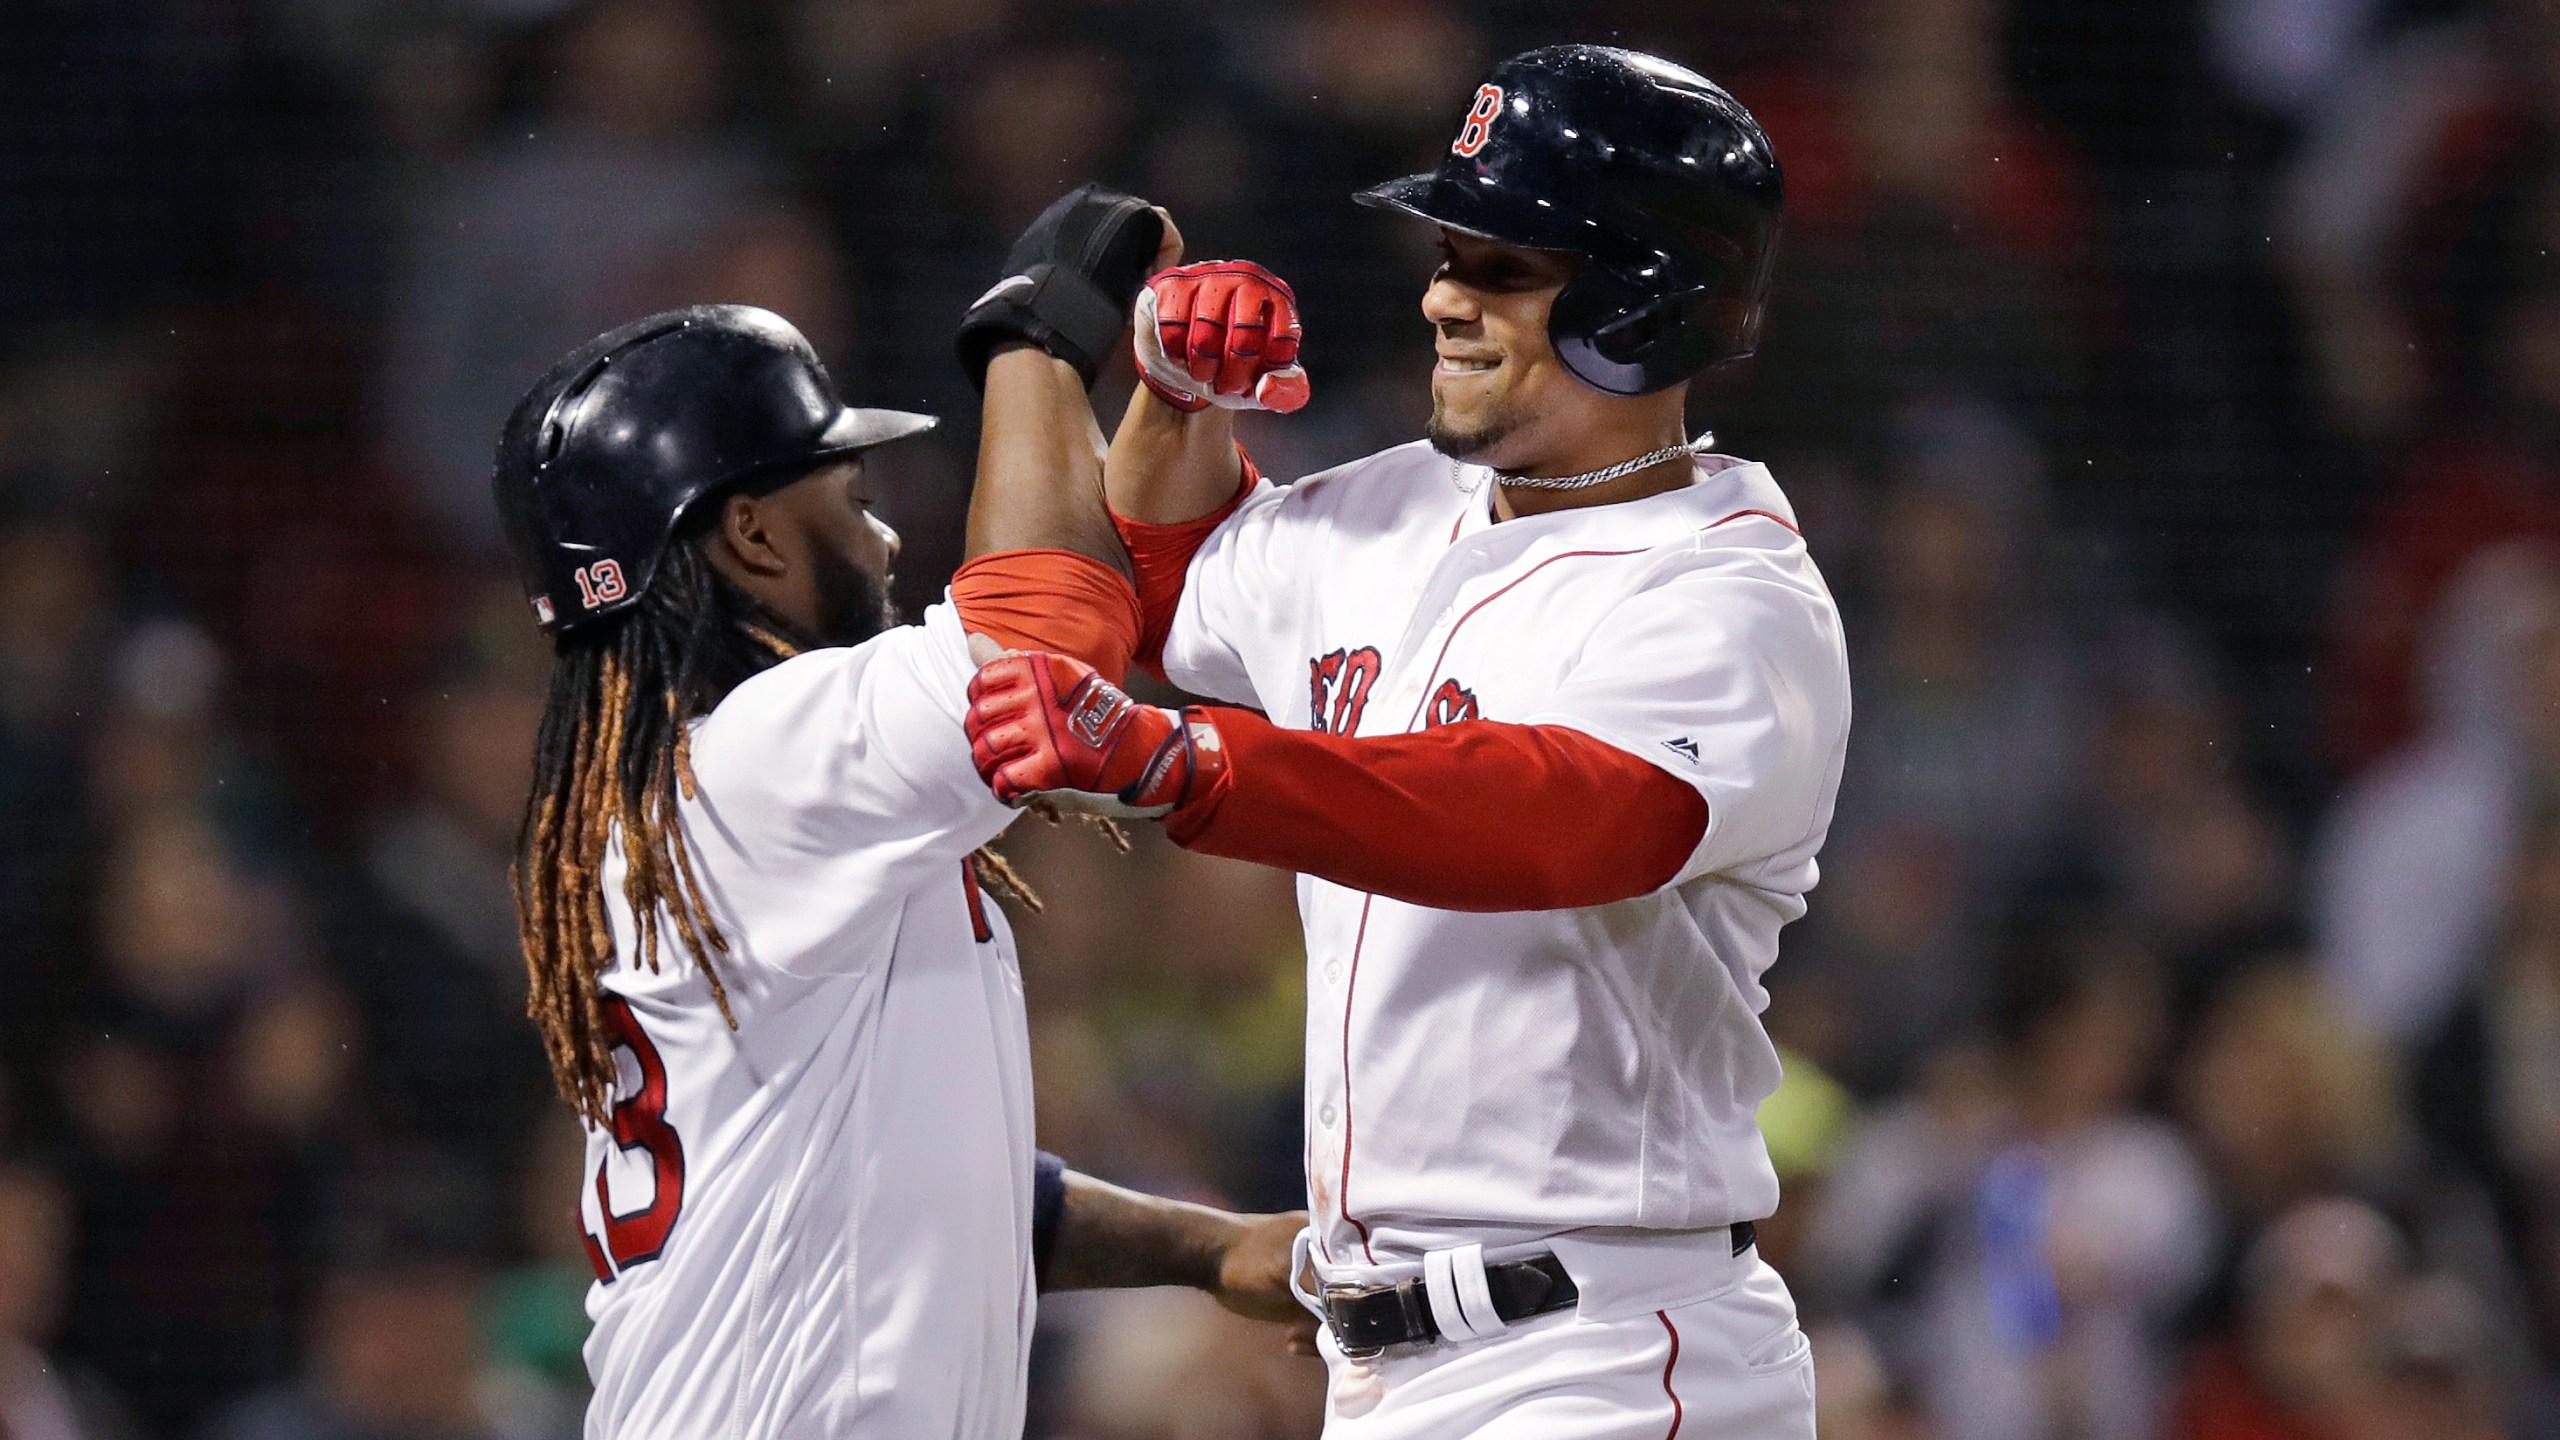 Athletics Red Sox Baseball_1526552677739